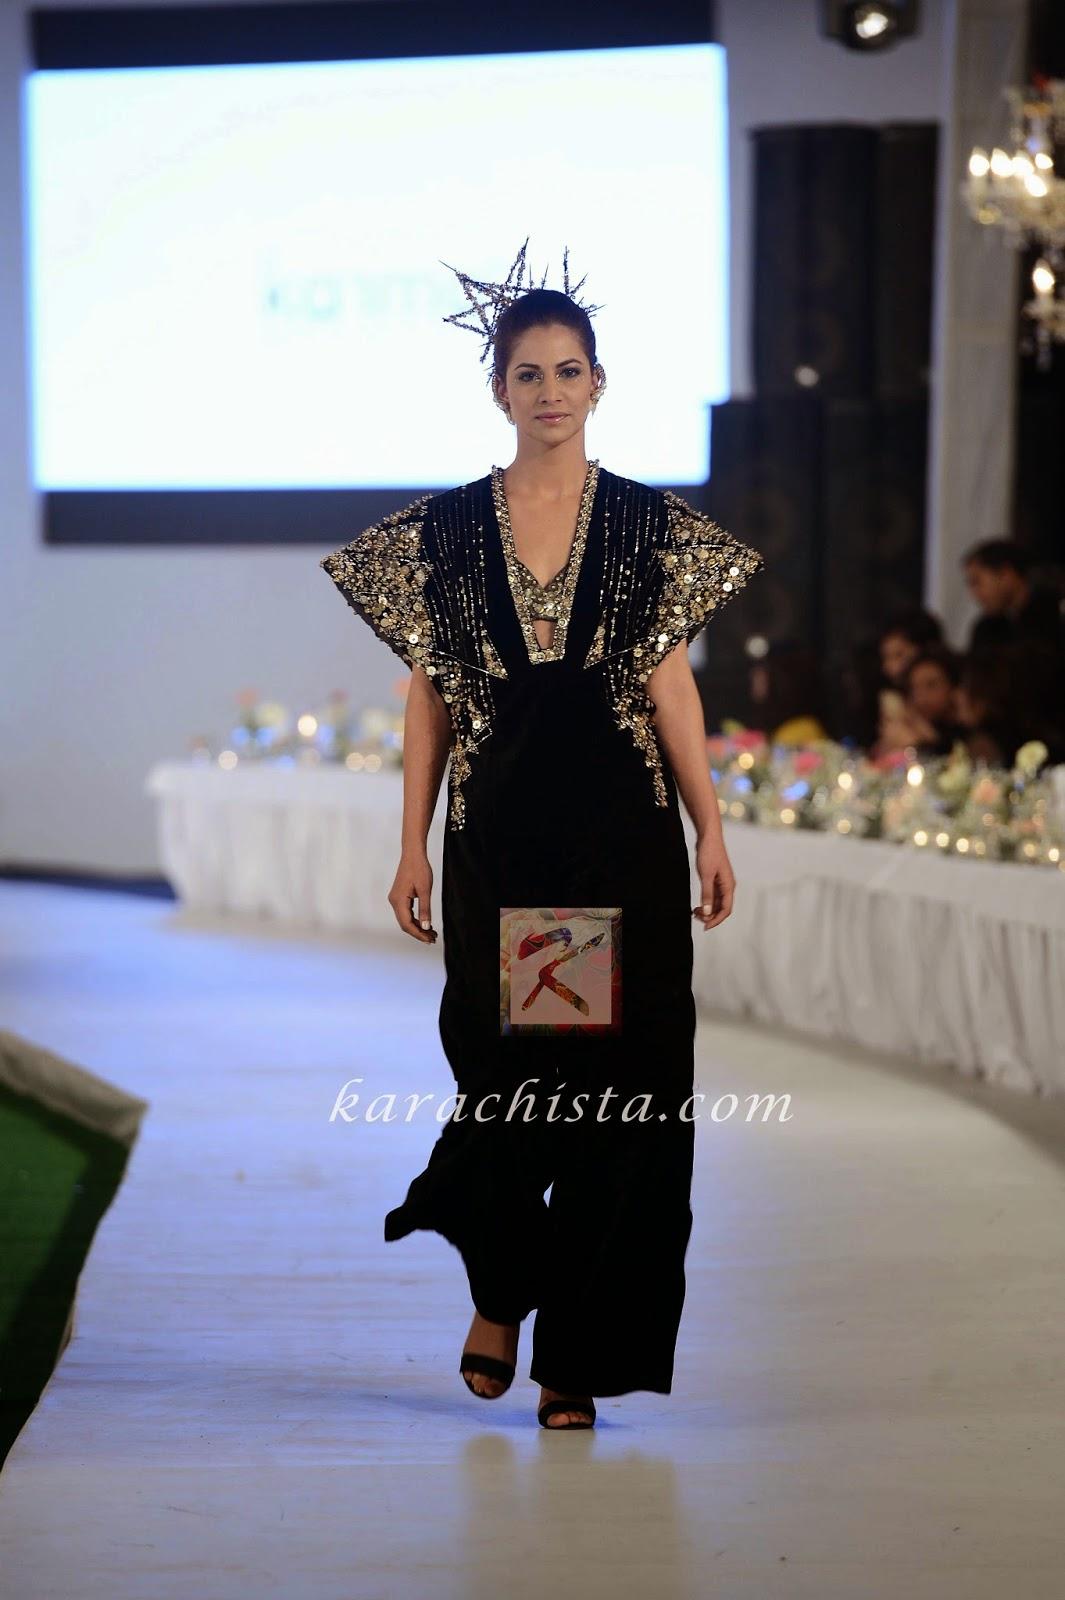 Cybil Chaudhry in KARMA Swarovski crystals ensemble